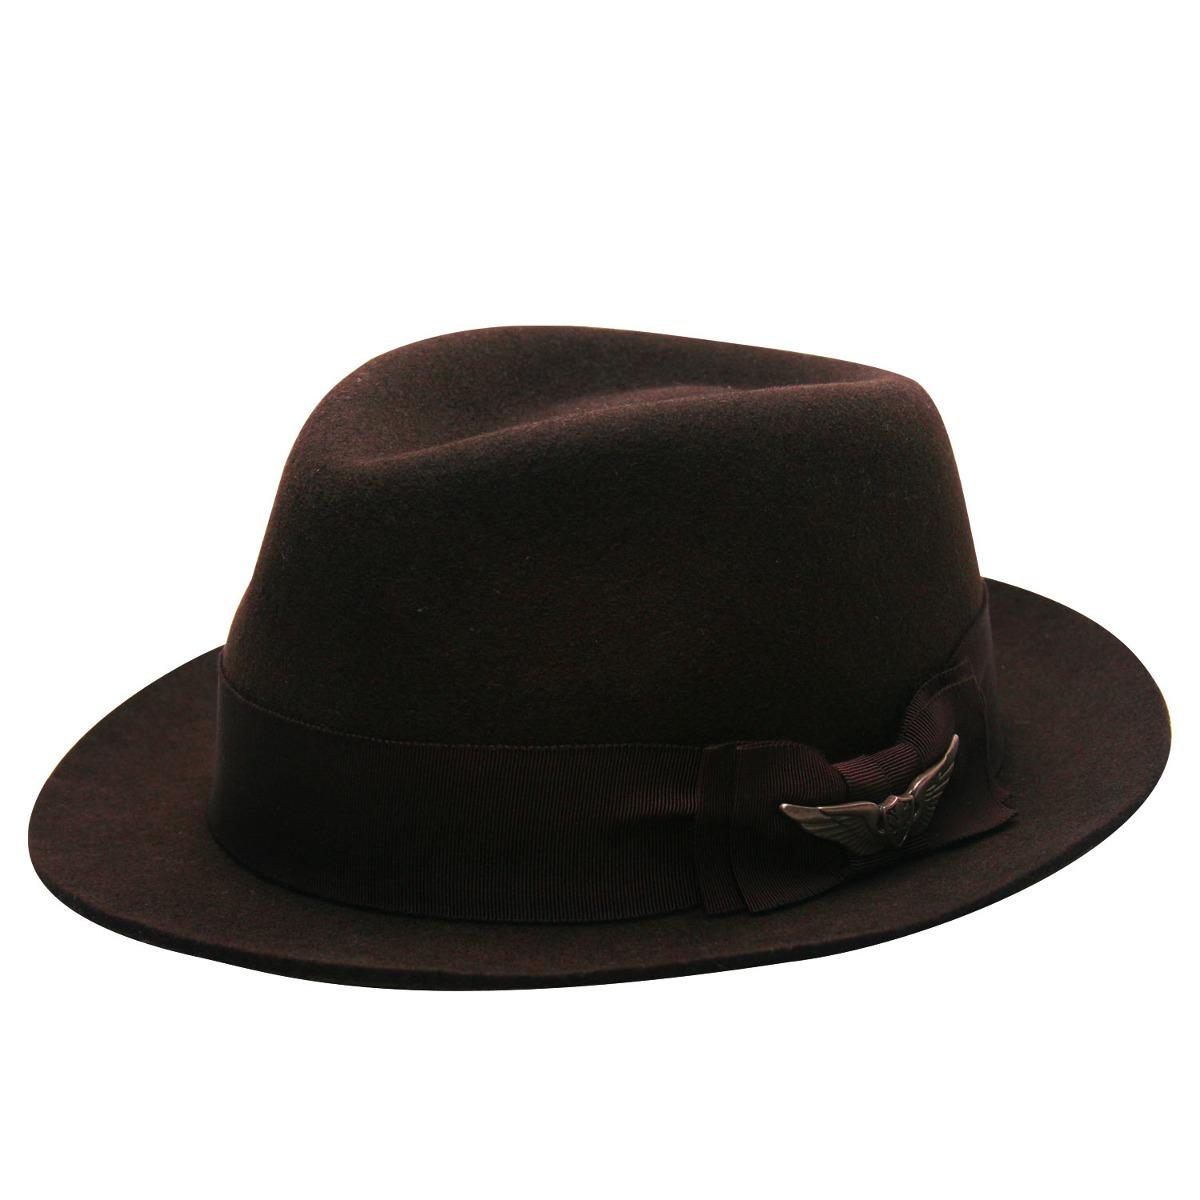 Chapéu Fedora Johnny-marrom-tamanho 59 - R  199 1aacb8341b1